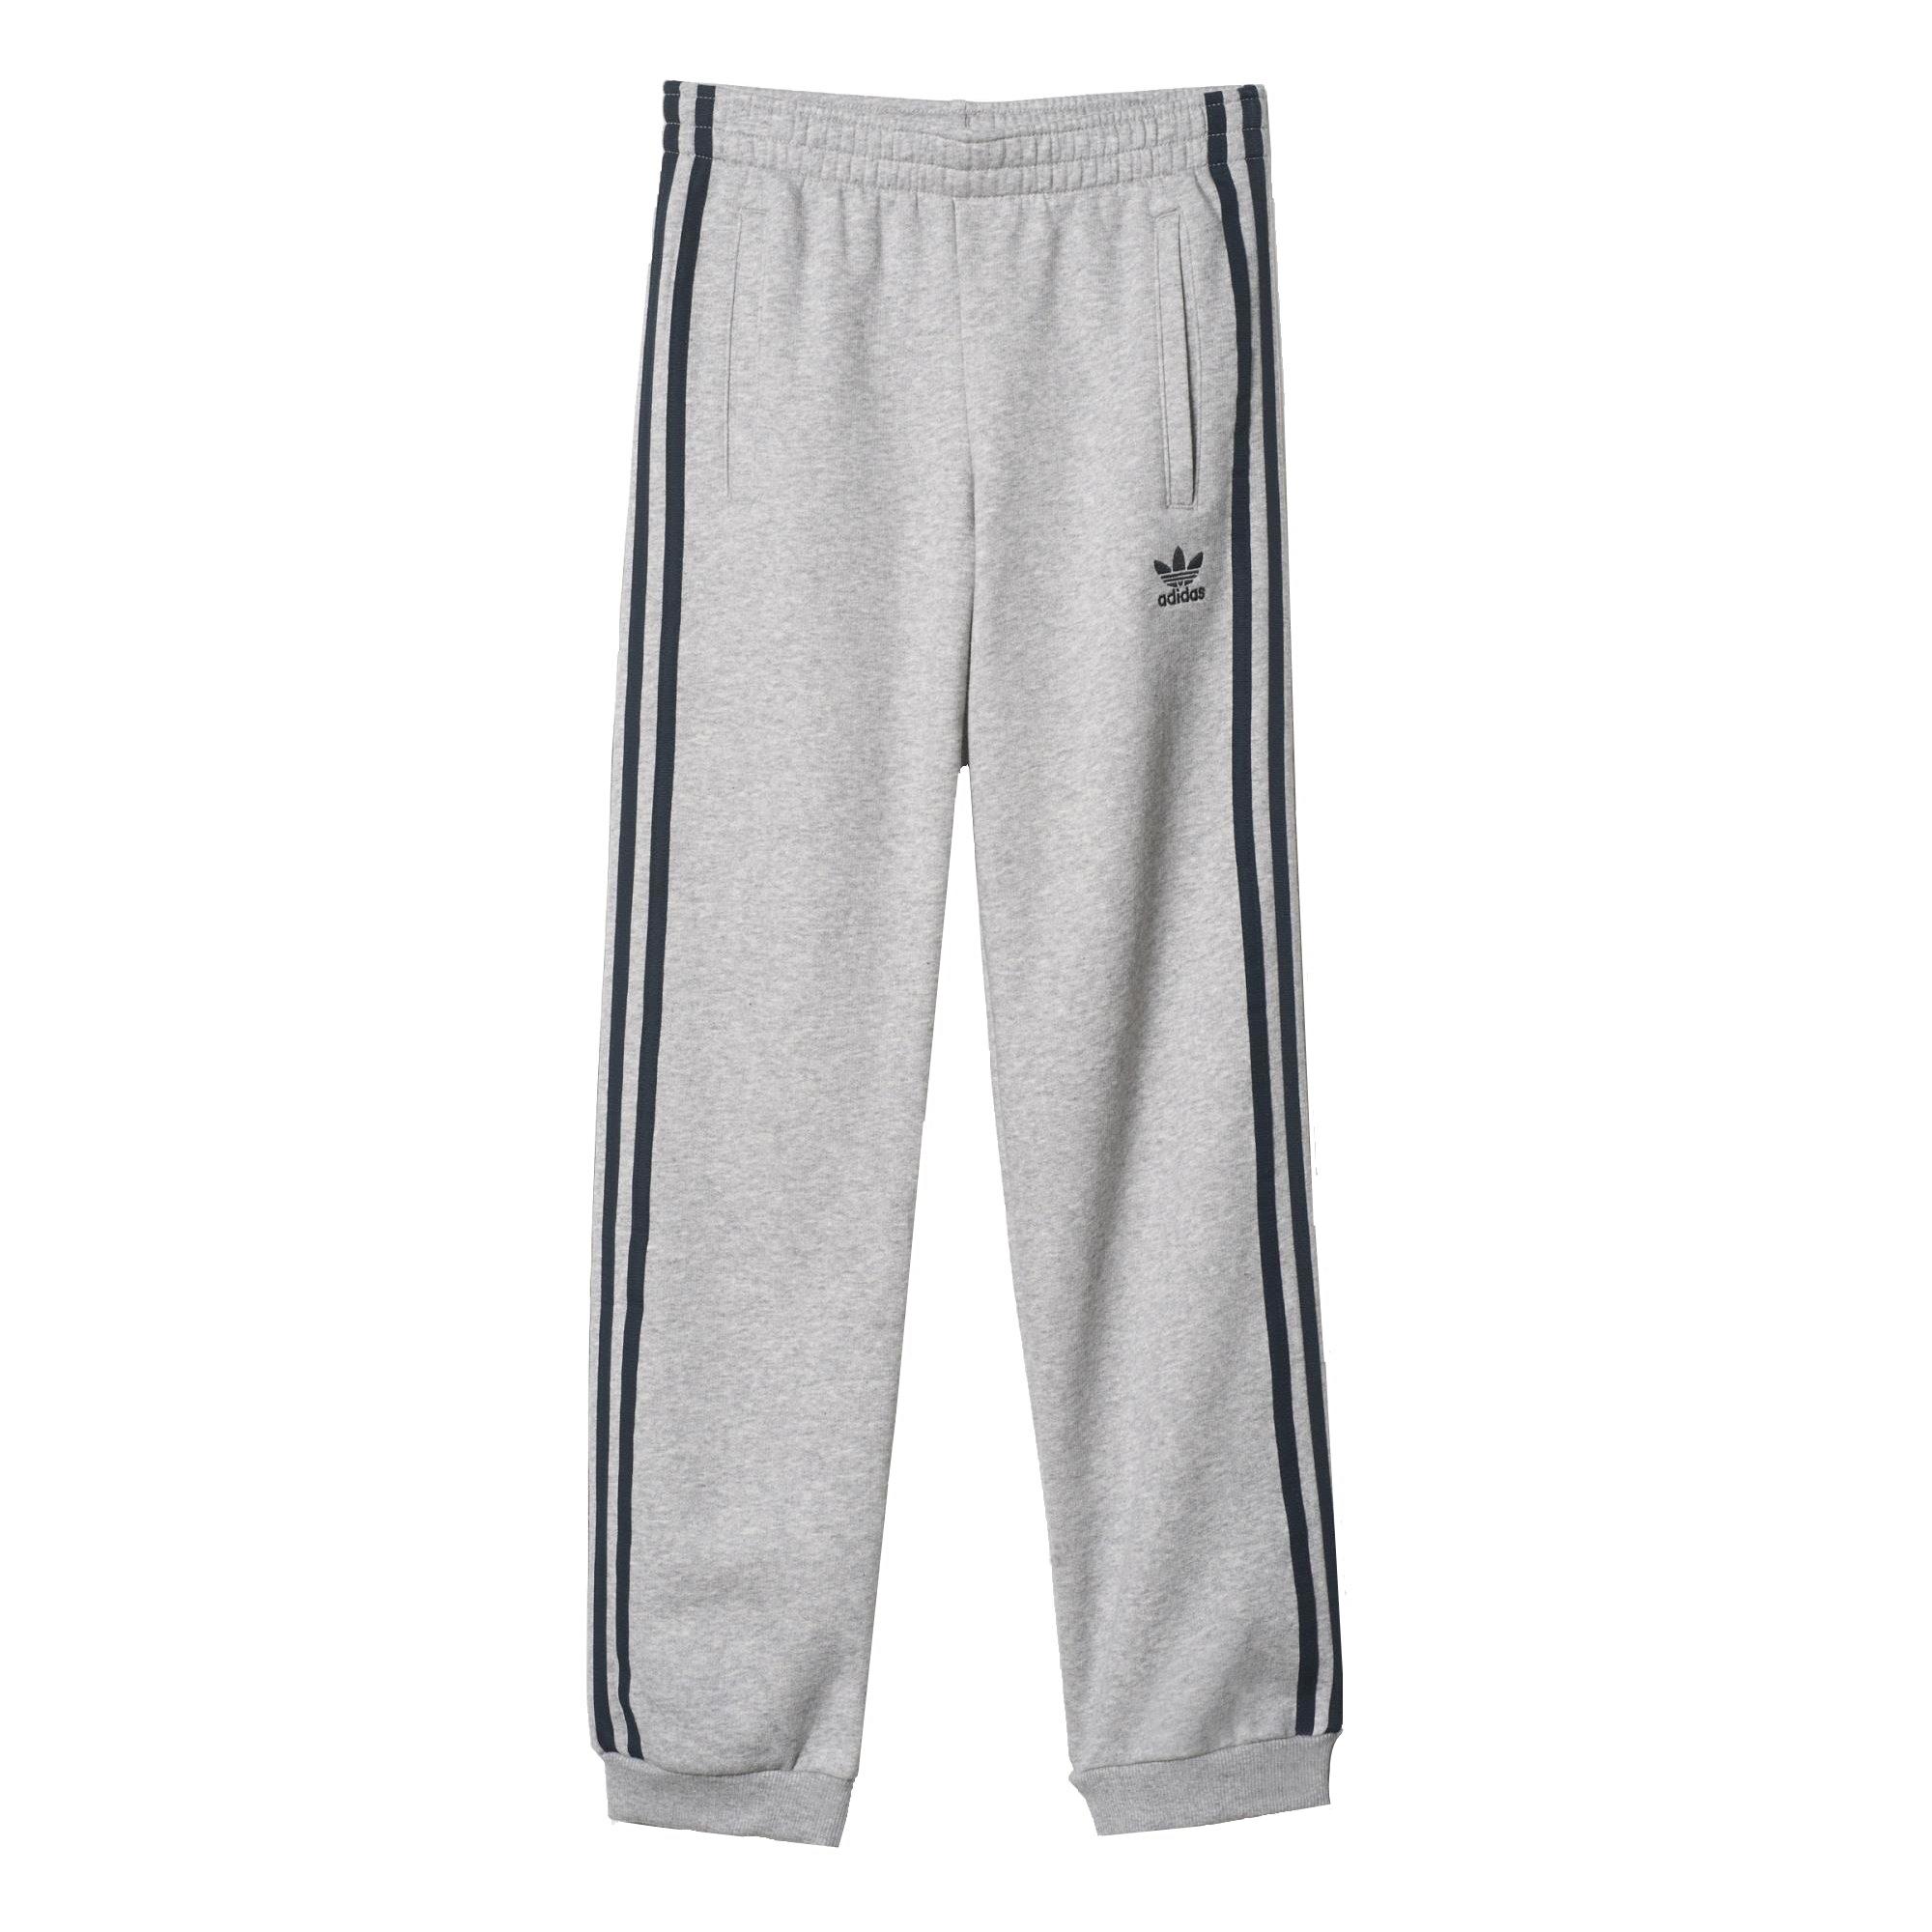 Originals Concrete Junglegrismarino Niño Pantalón Adidas 3TFc1JulK